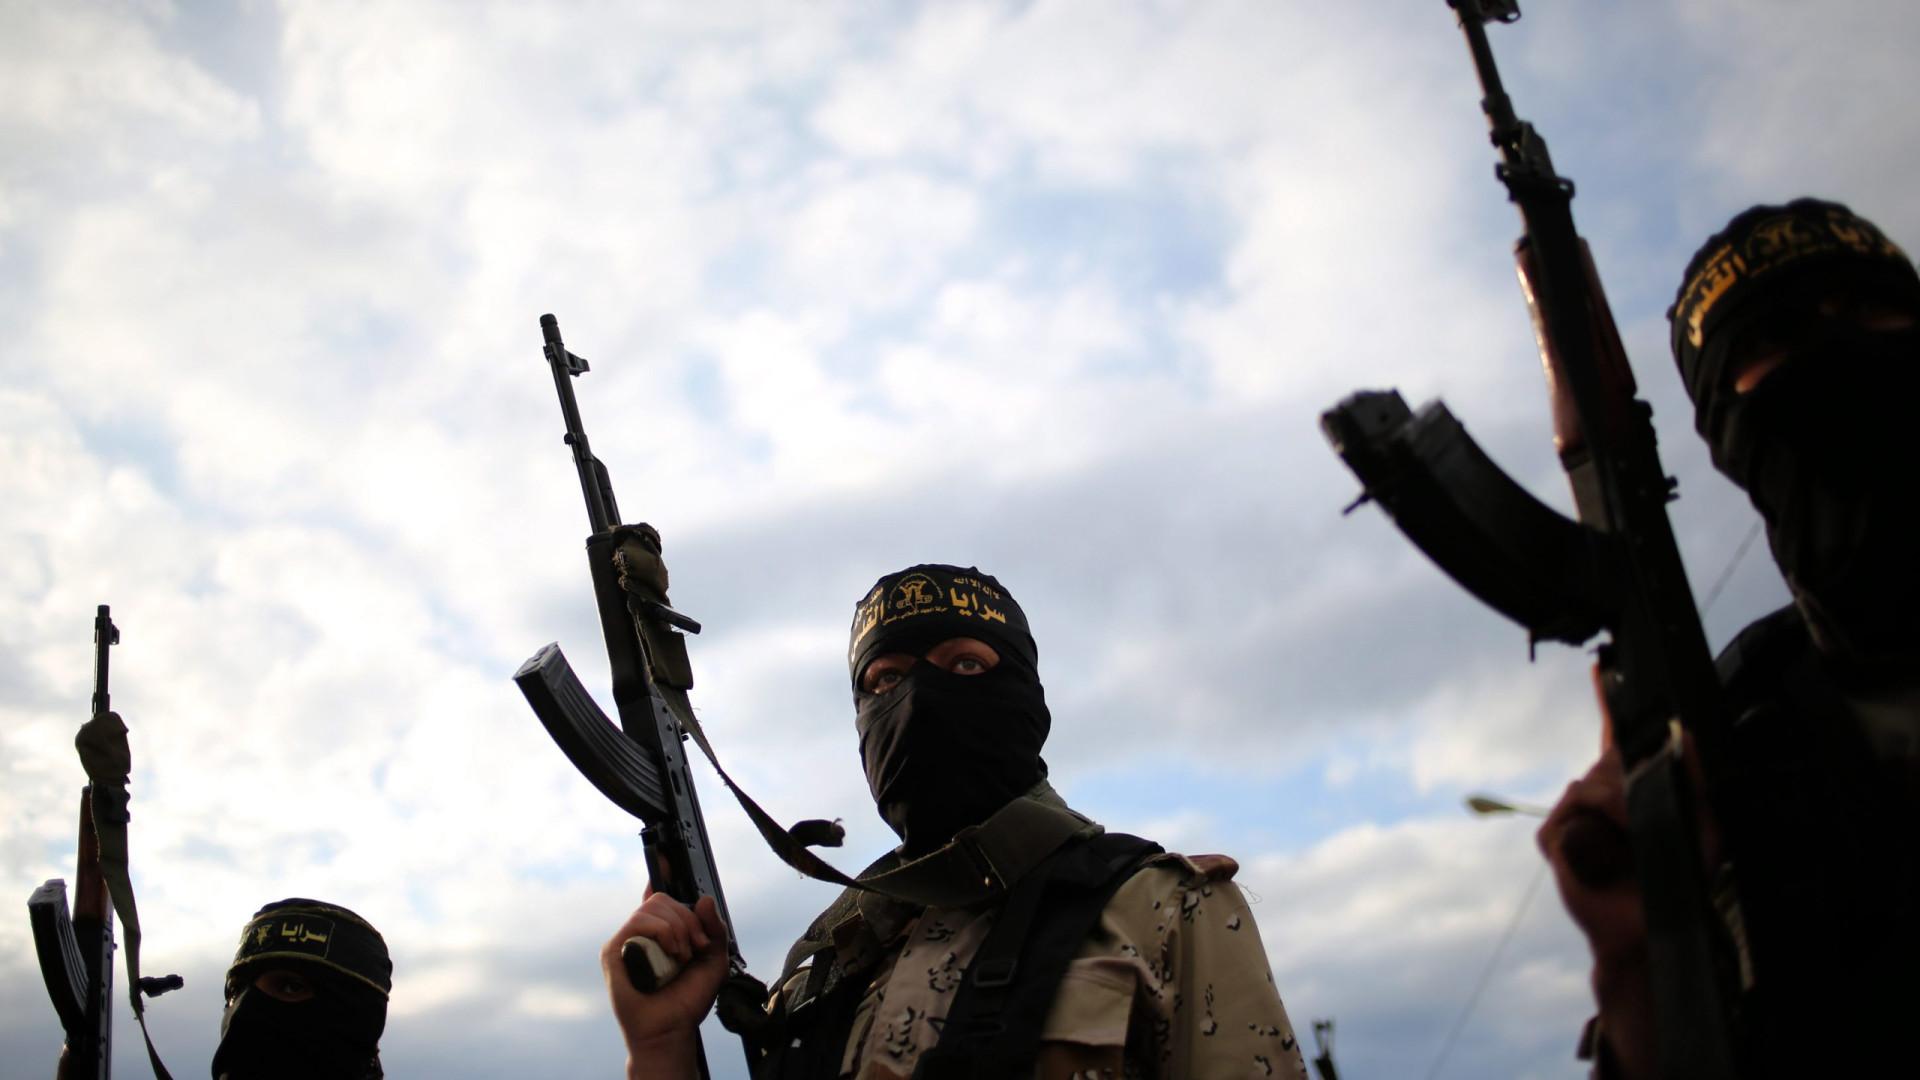 Estado Islâmico reivindica ataque no Mali que fez 54 mortos